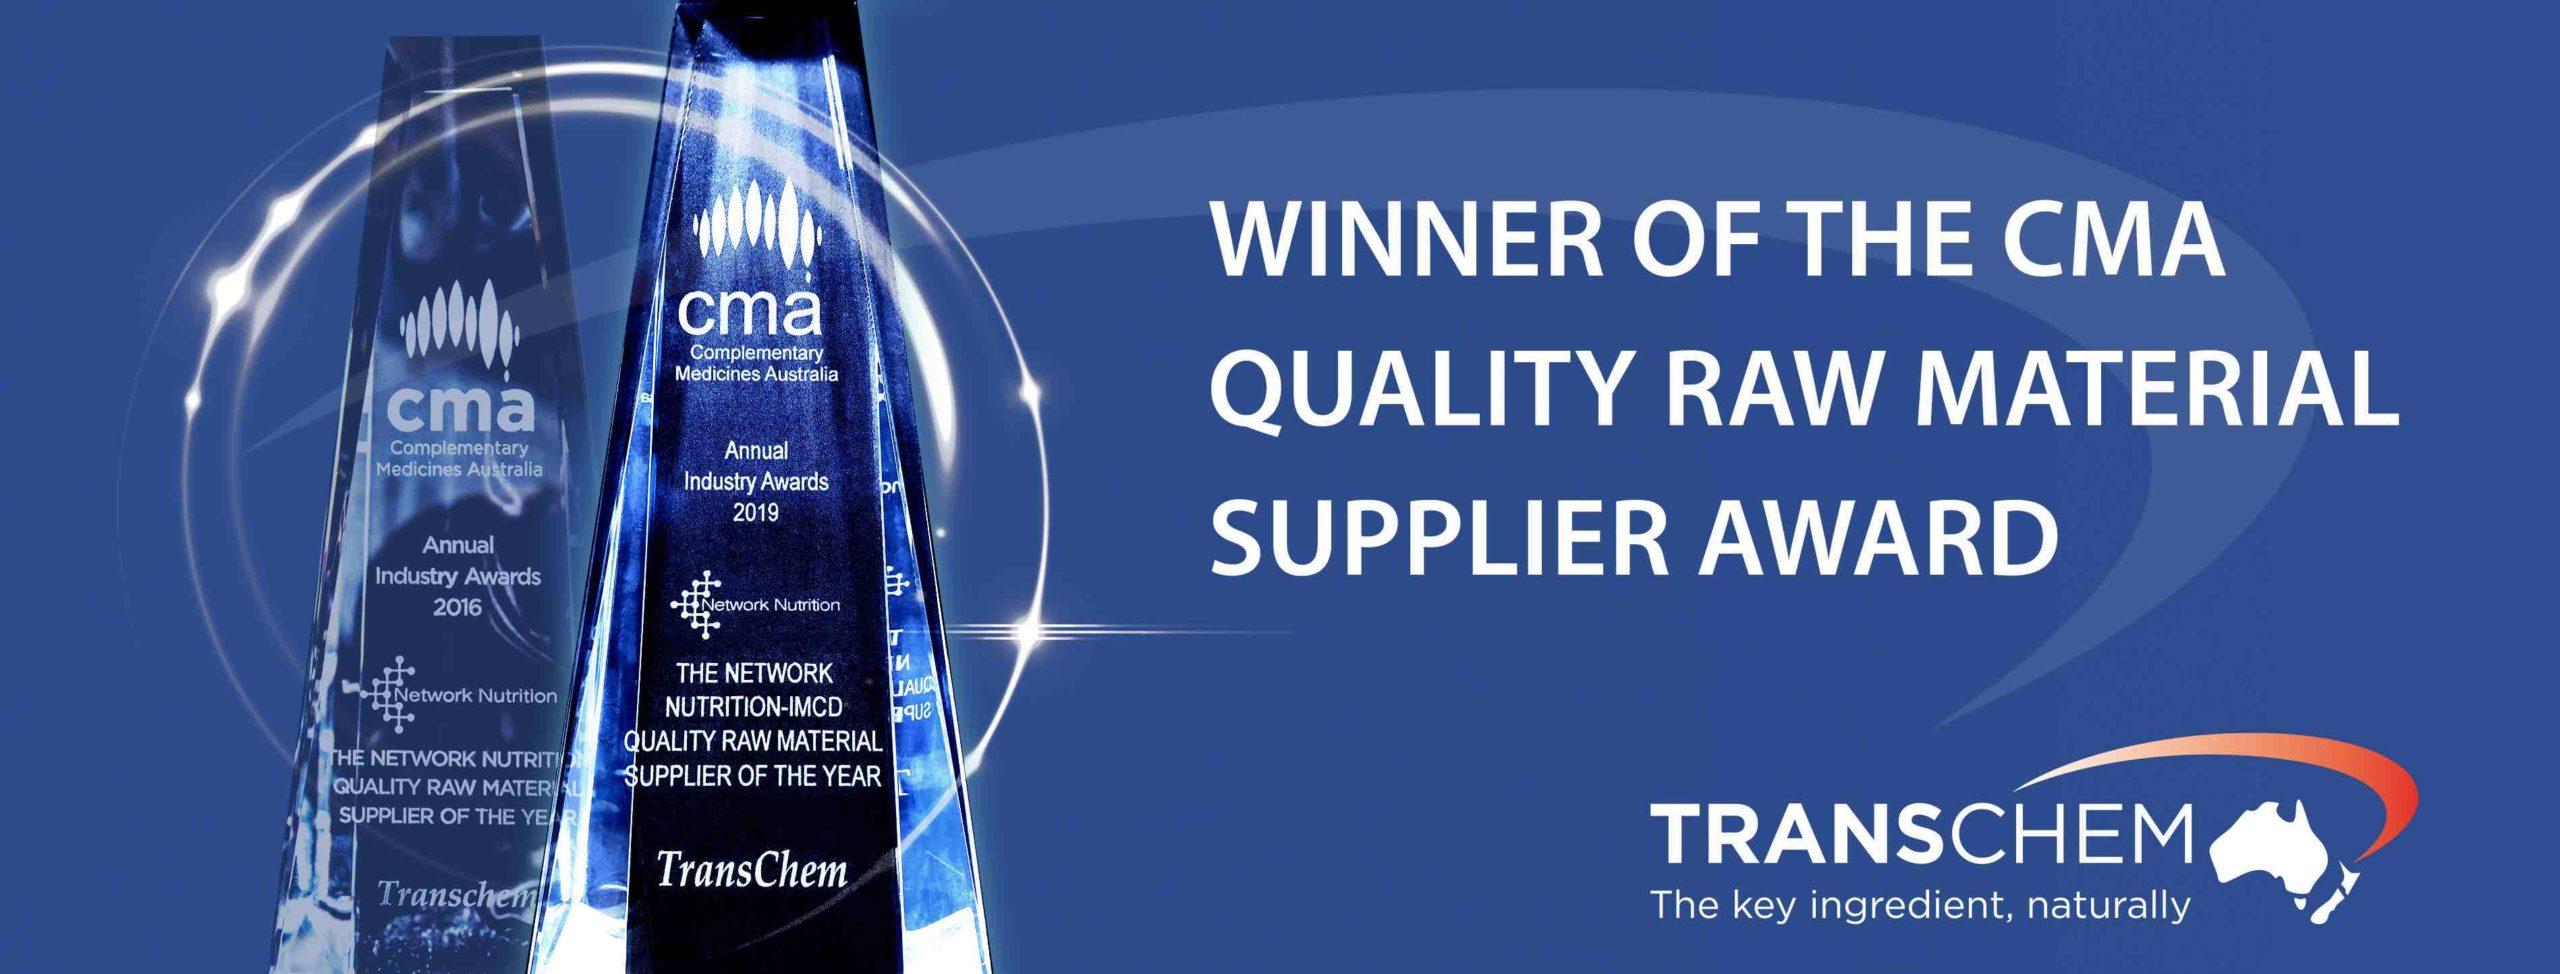 TransChem-Award-Banner-2016-2019-scaled